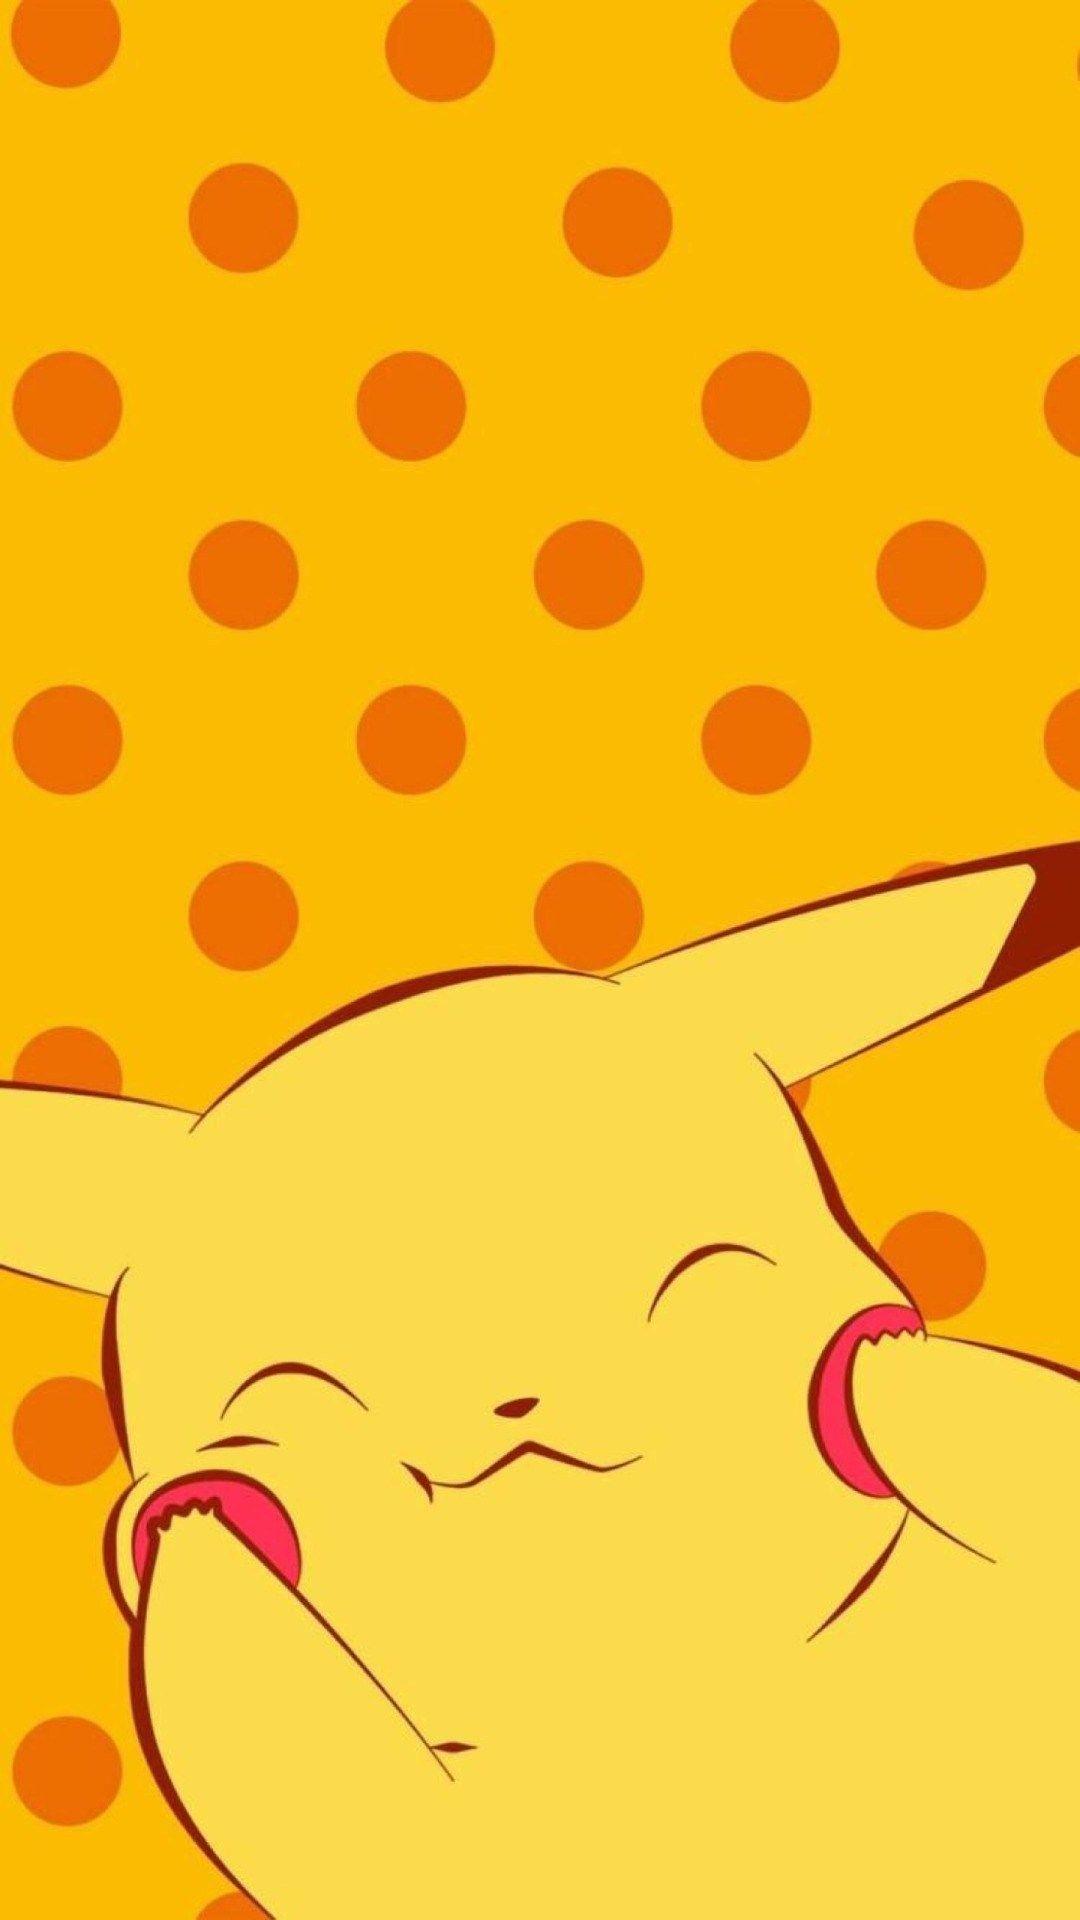 Pokemon Cool Cool iPhone Wallpaper